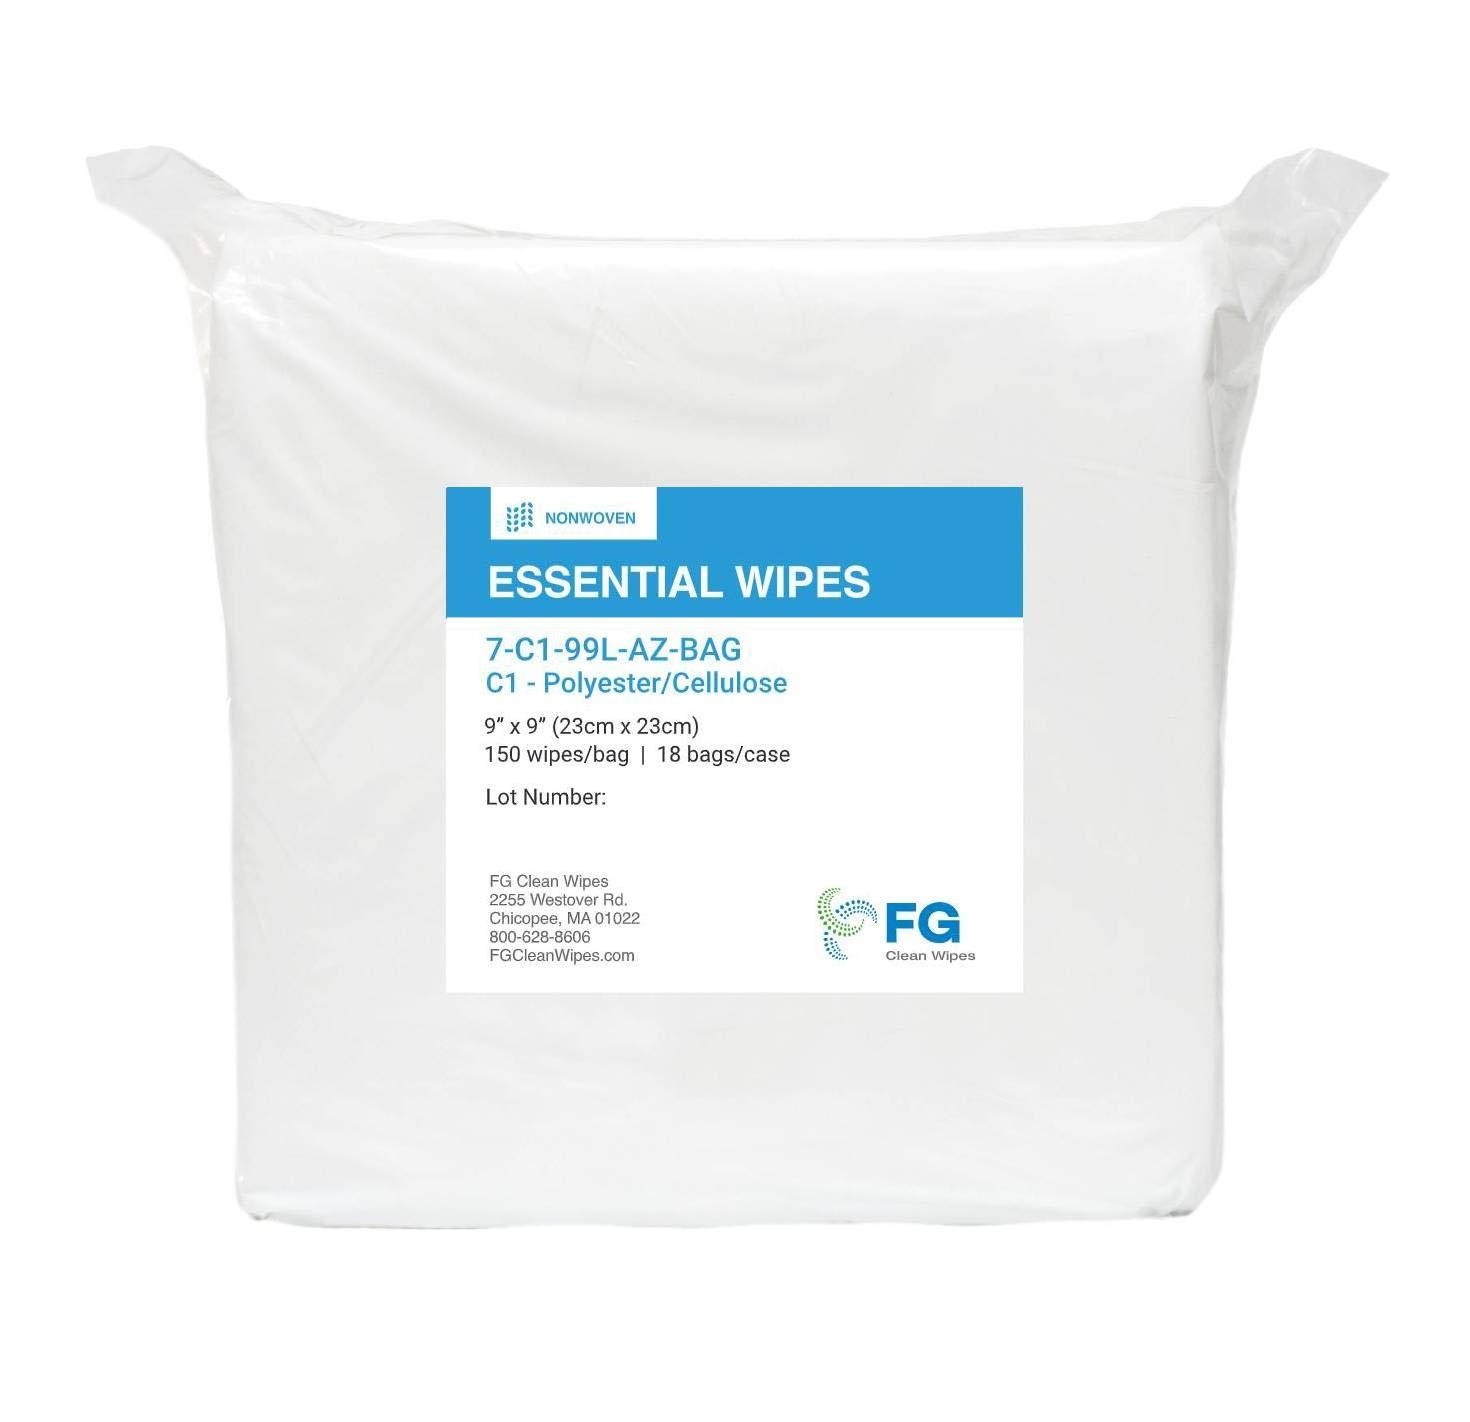 "FG Clean Wipes 9""x9""- C1 - Premium Polyester Cellulose Wipes- 1 Bag - 300 Wipes/Bag (7-C1-99L-AZ-BAG)"